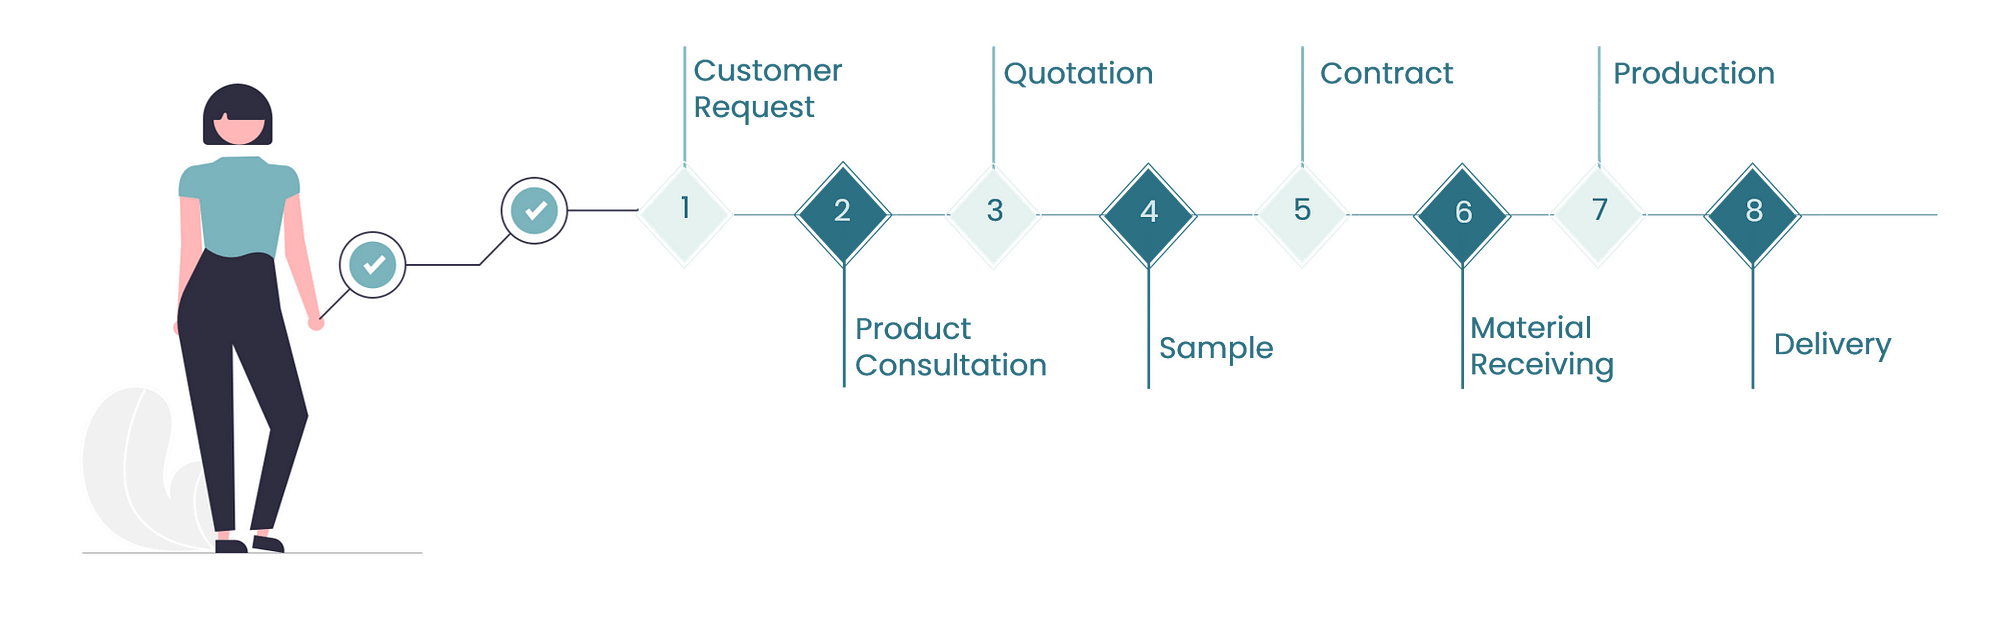 ecoori-process